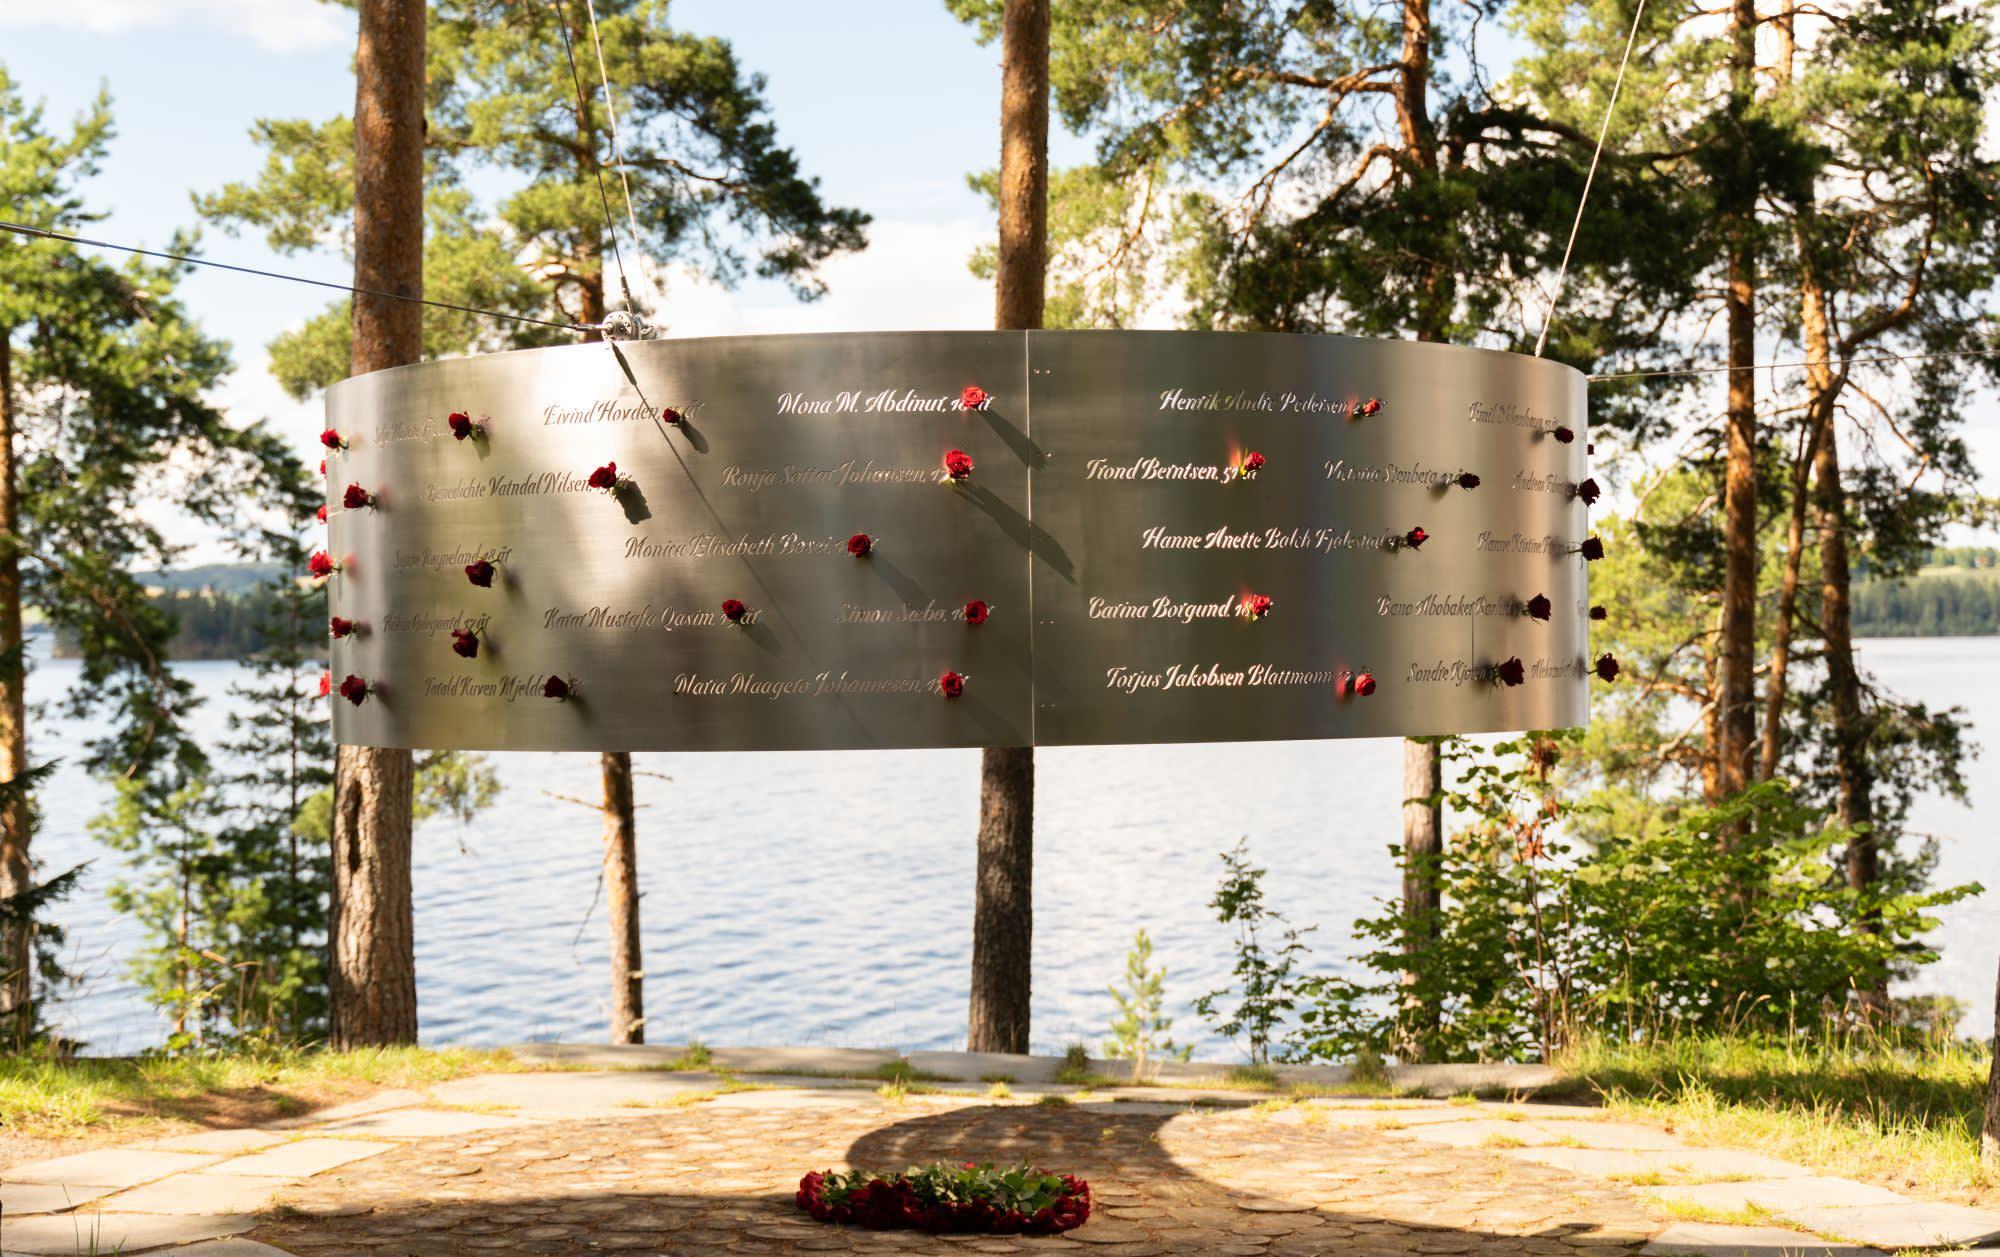 Minnesmerket på Utøya